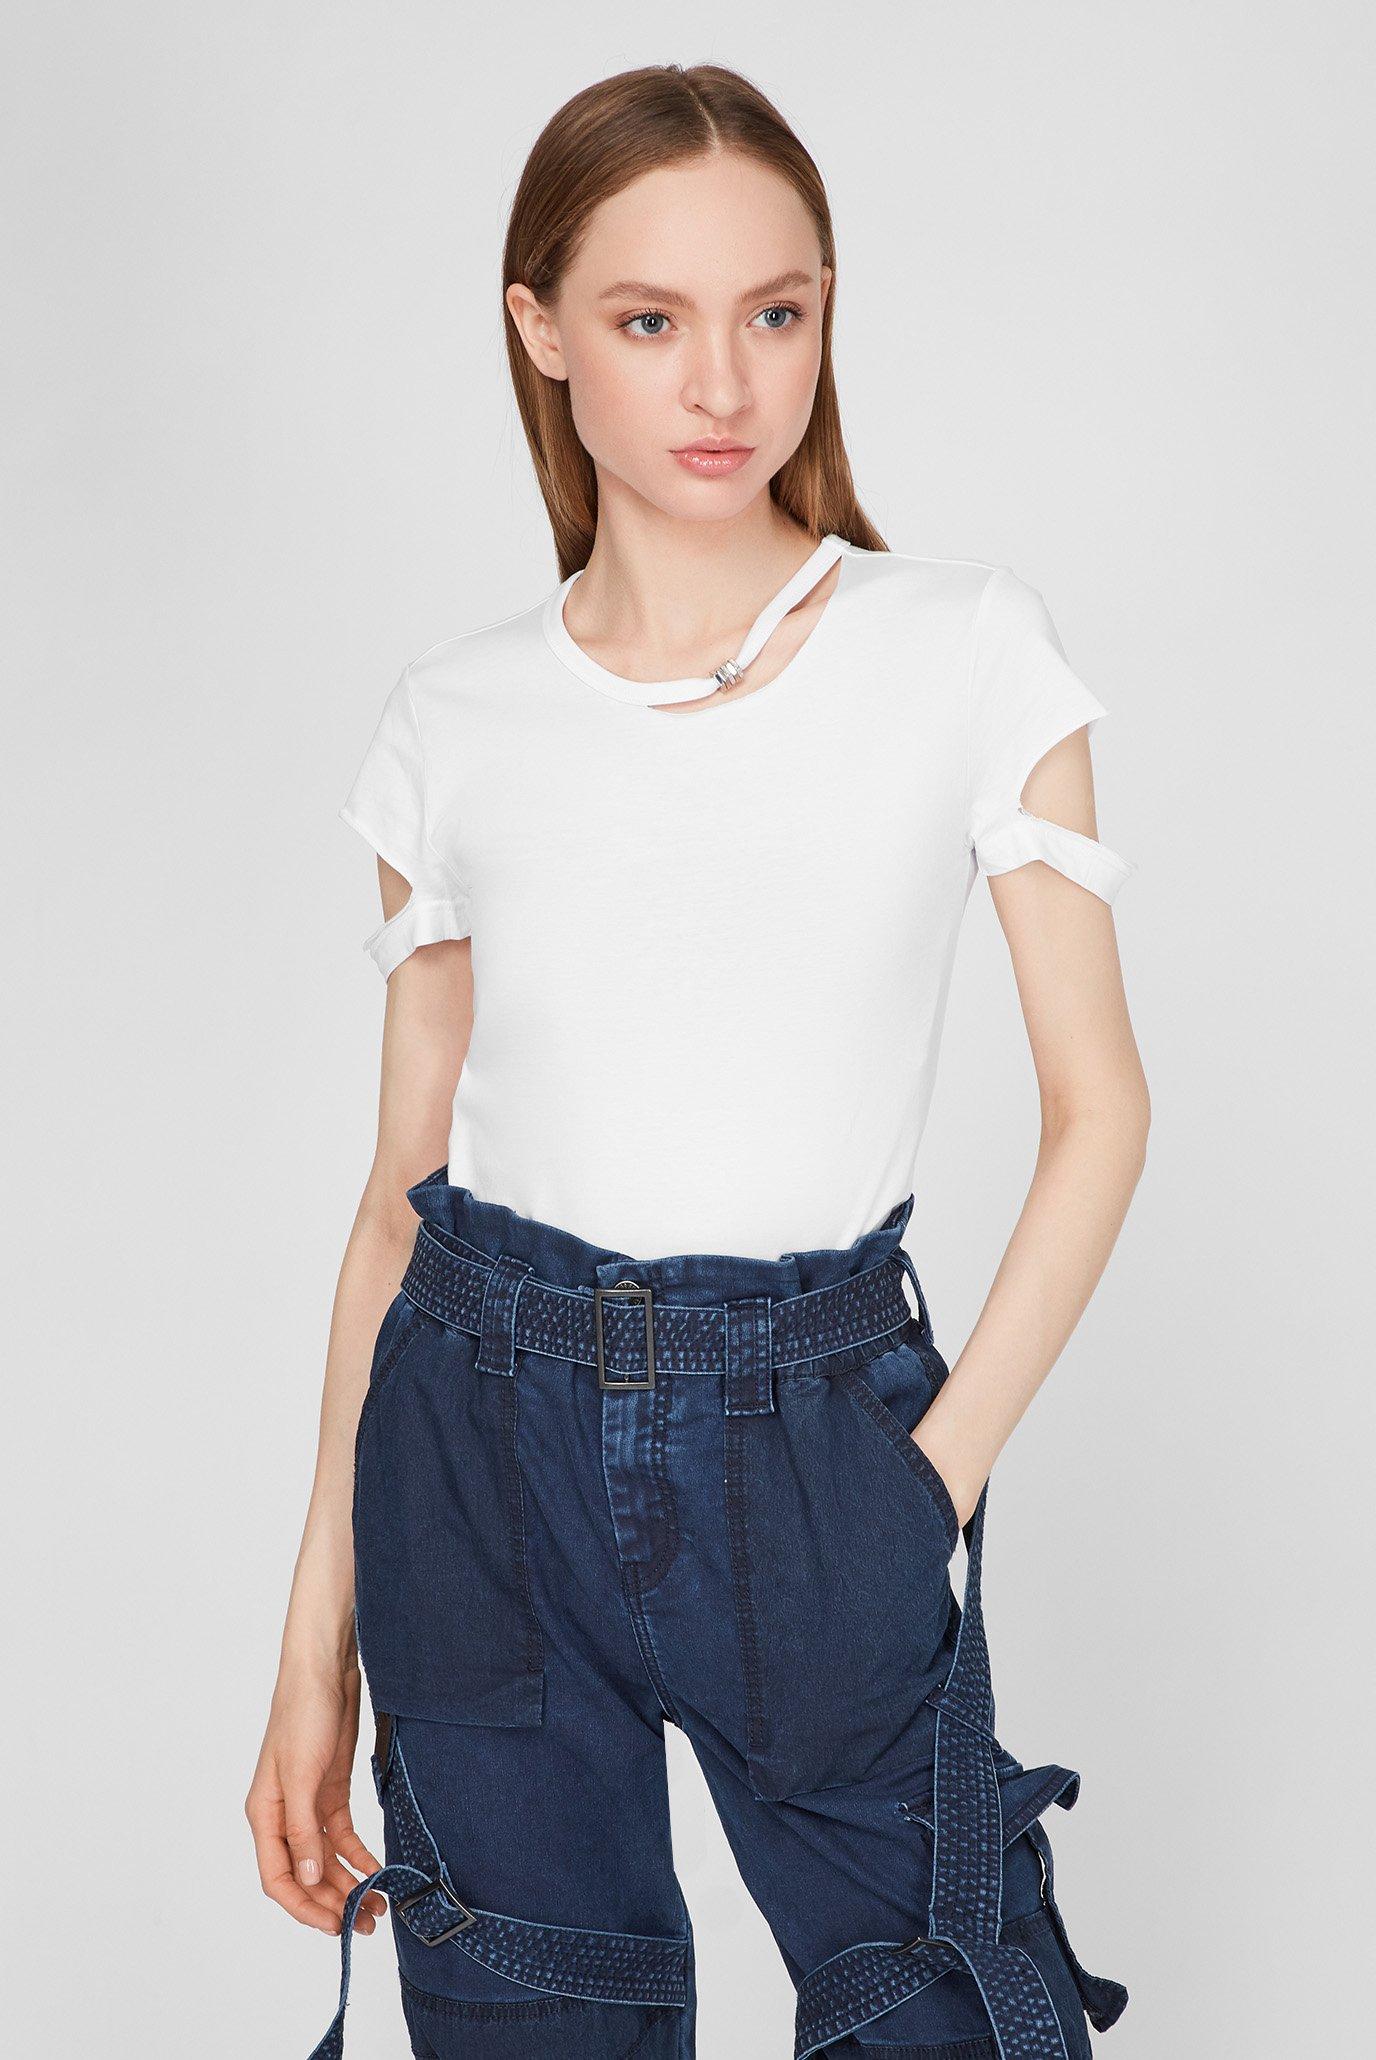 Женская белая футболка T-BULLOCK T 1